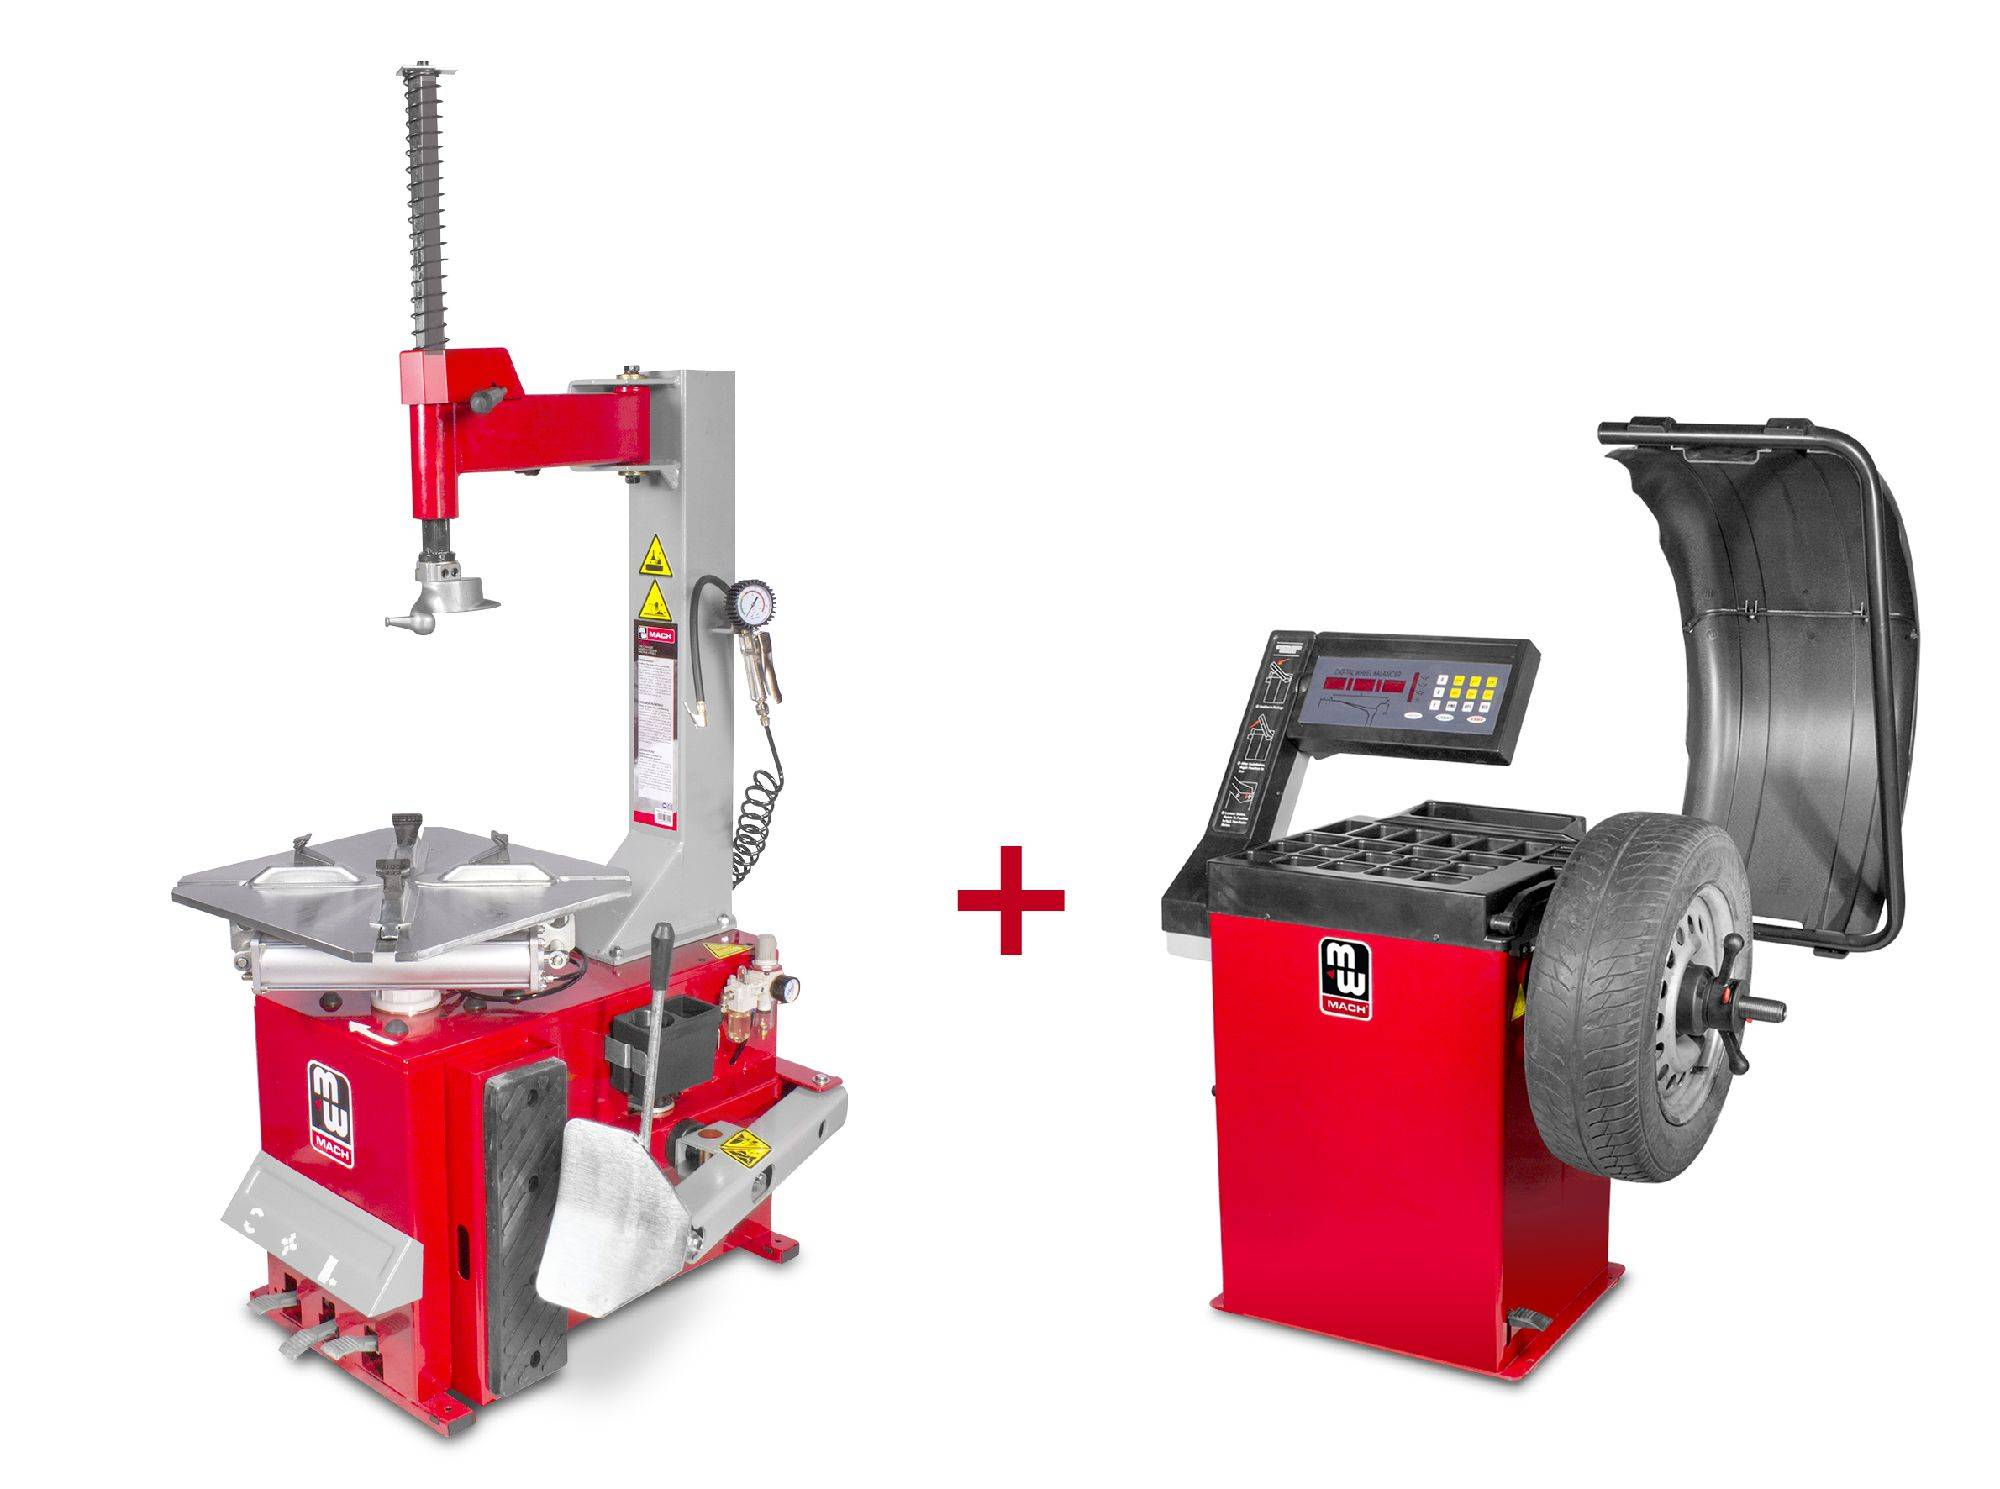 Mw-tools Pack démonte-pneu BT100 3x380V et équilibreuse de roues BB200 220V MW-Tools BT100 SET2